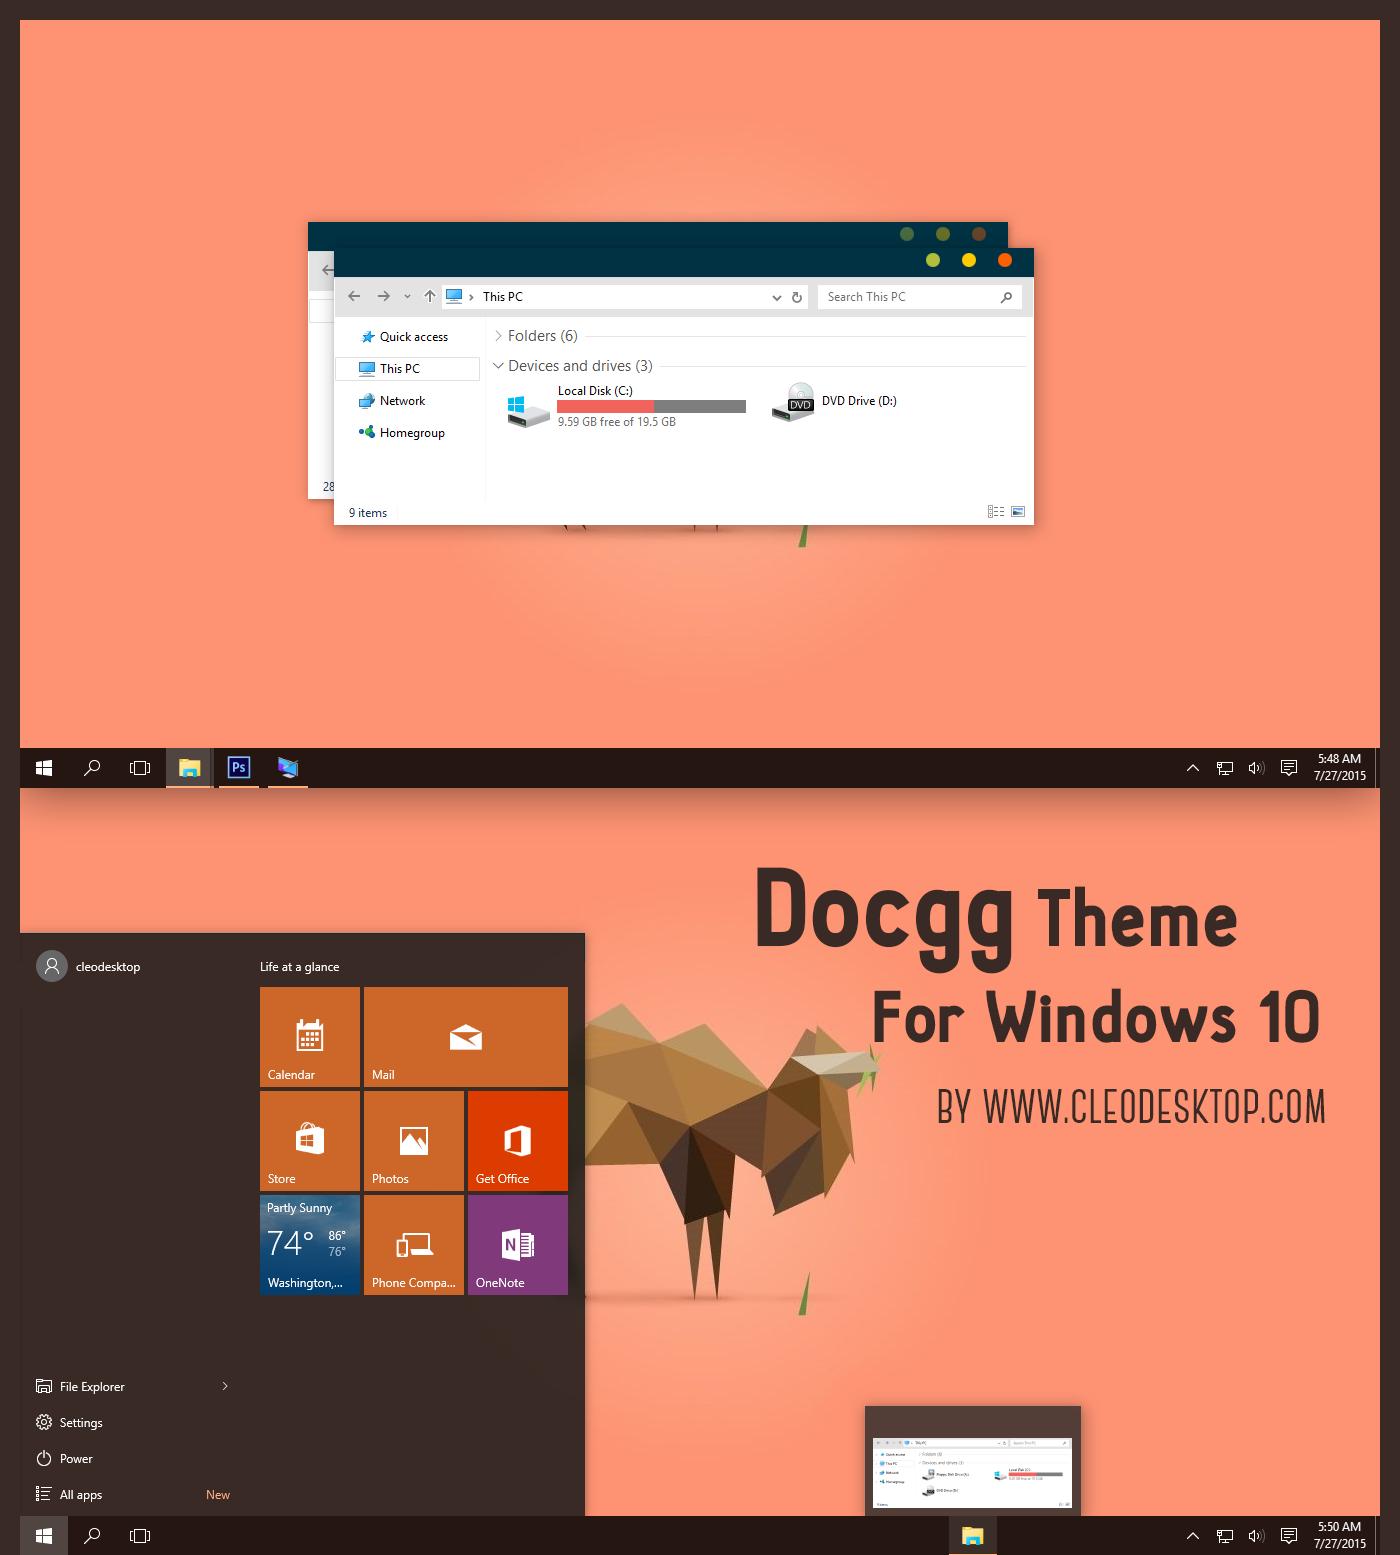 Windows Xp Theme File Software: Docgg Theme Flat Cho Windows10 RTM Build 10240